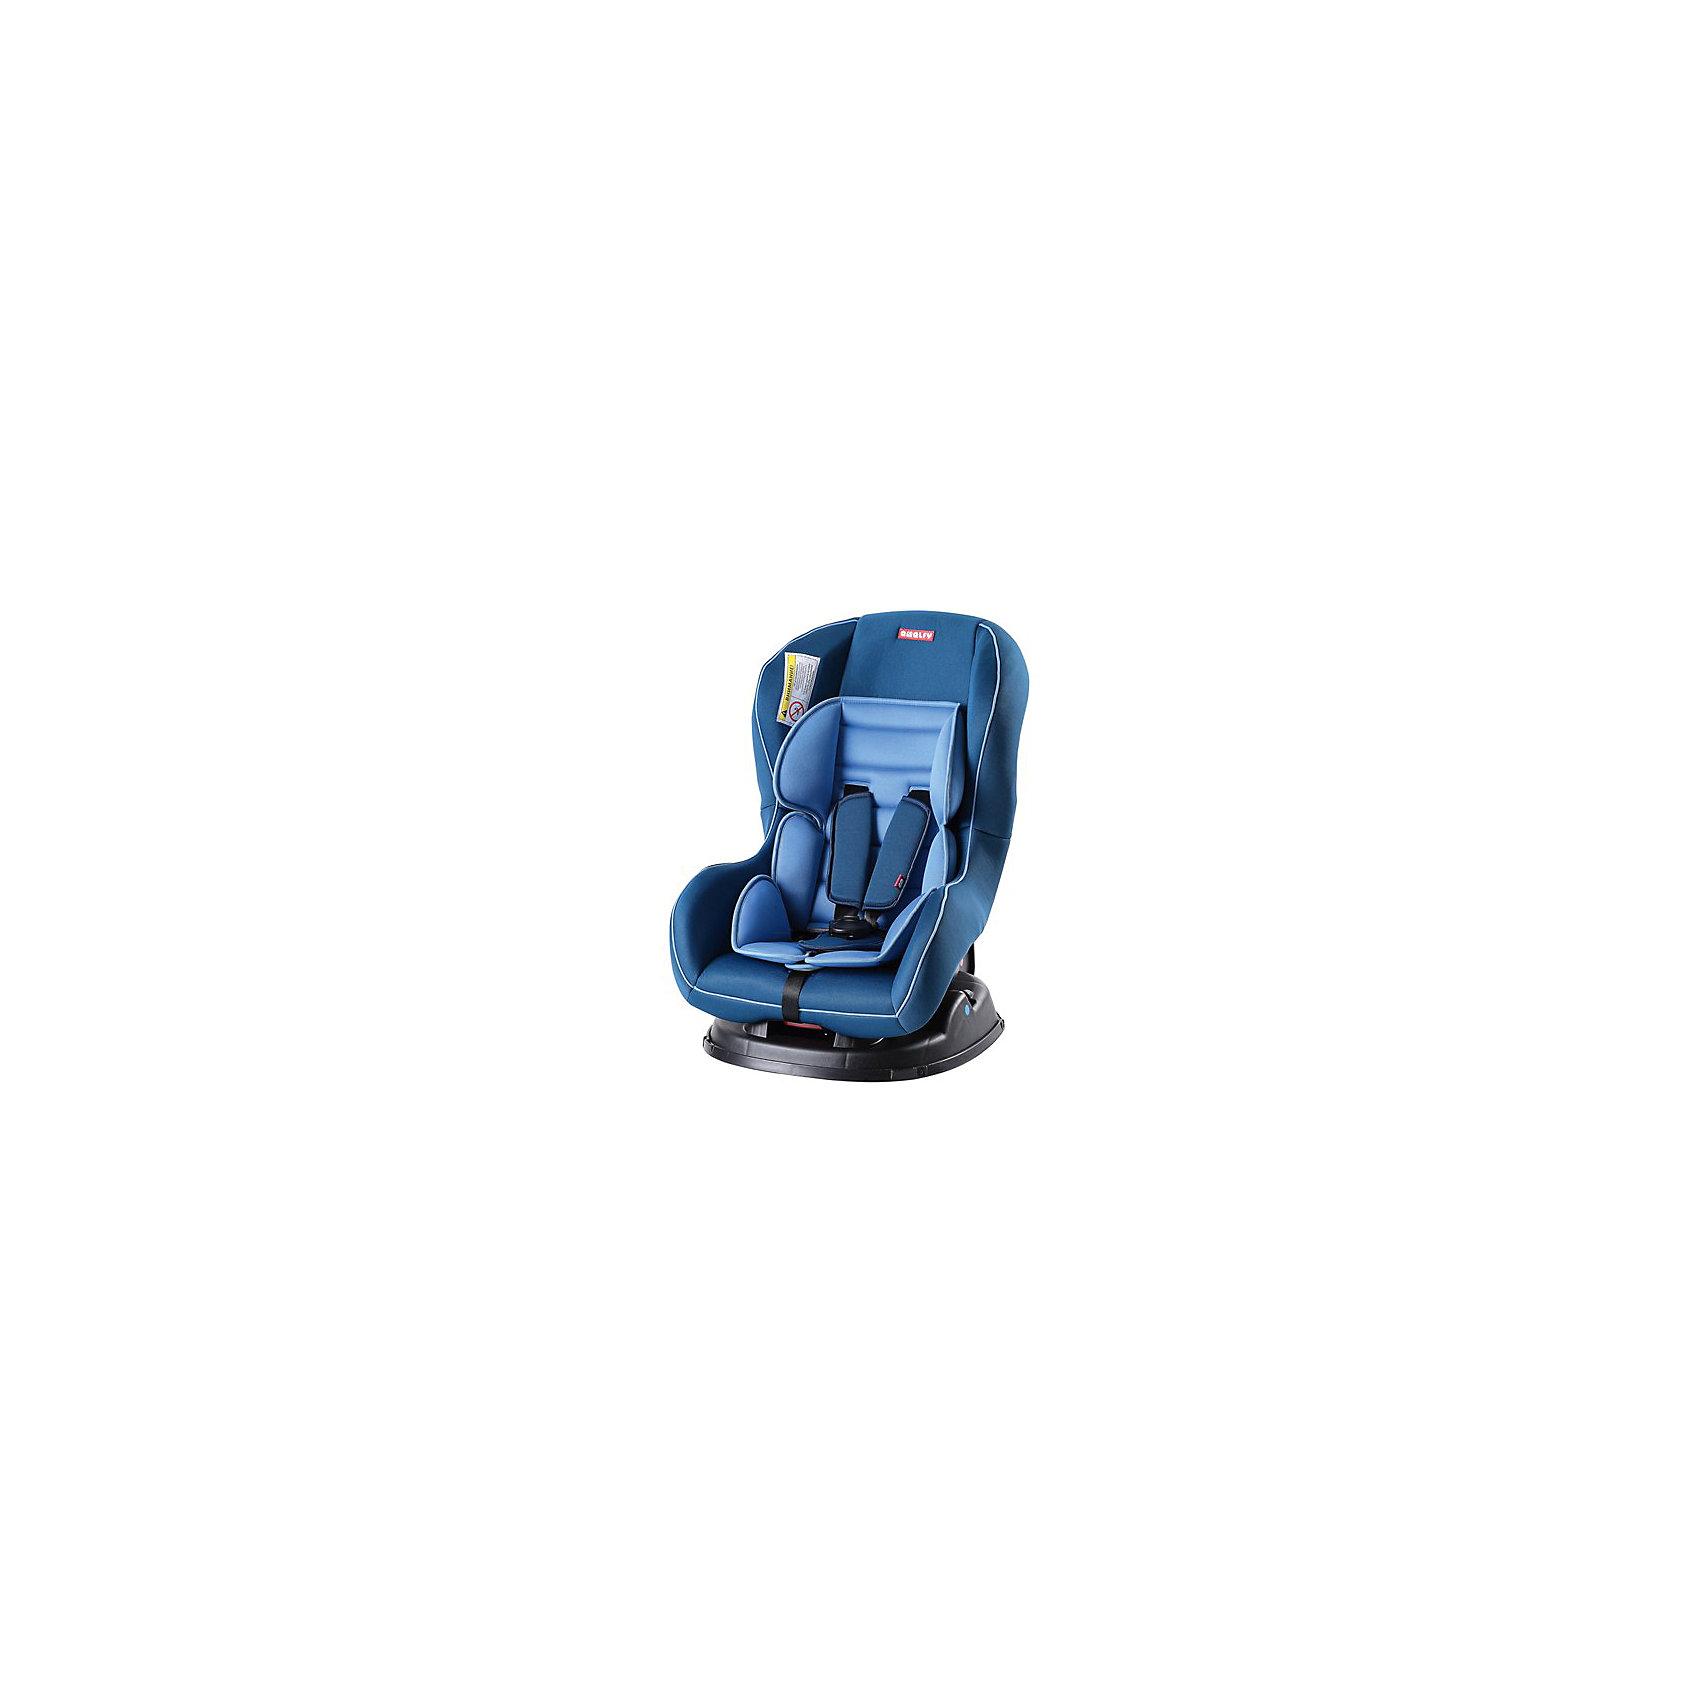 - Автокресло НB-383, 0-18 кг, Amalfy, голубой amalfy нb 508 black